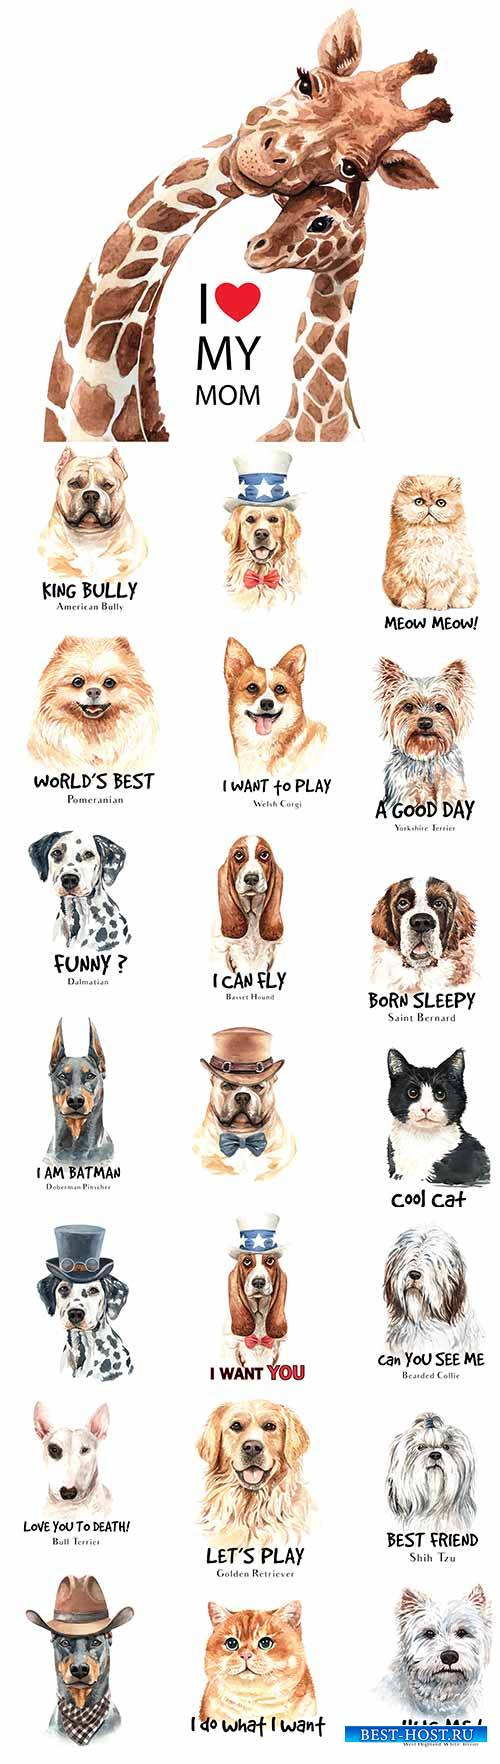 Собаки и коты в векторе / Dogs and cats in vector